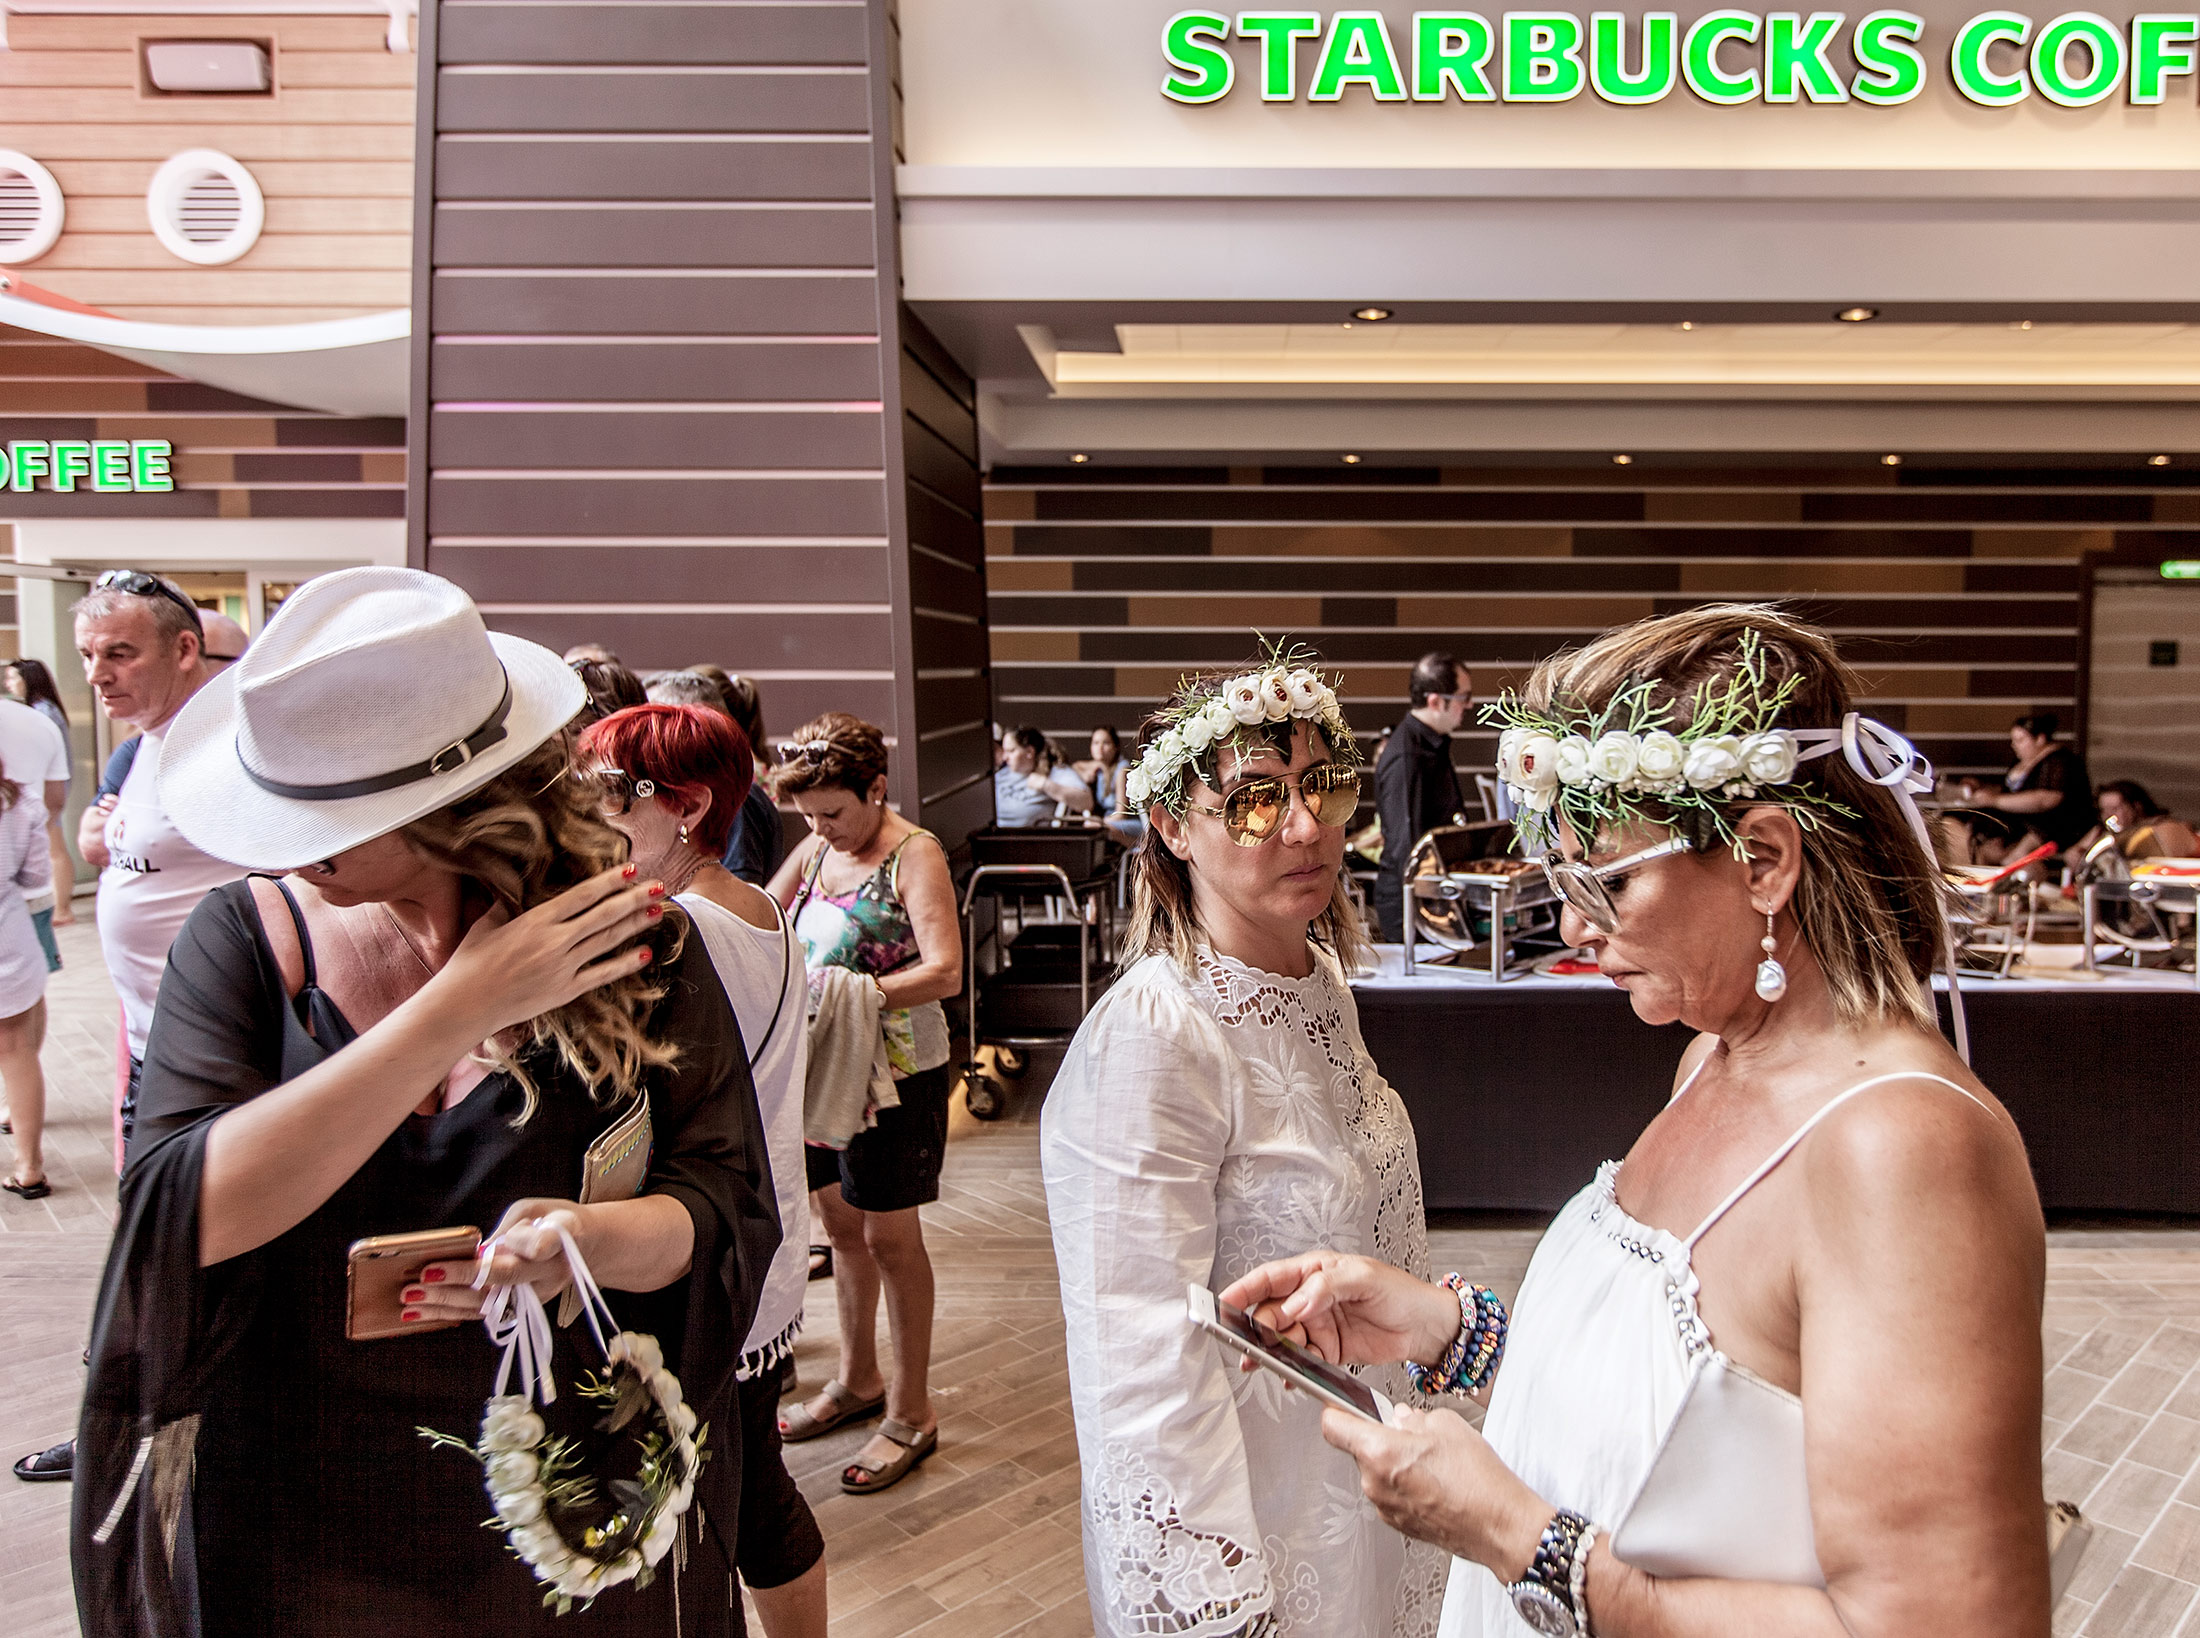 Royal Caribbean, Harmony of the Seas, starbucks cafe at the boardwalk